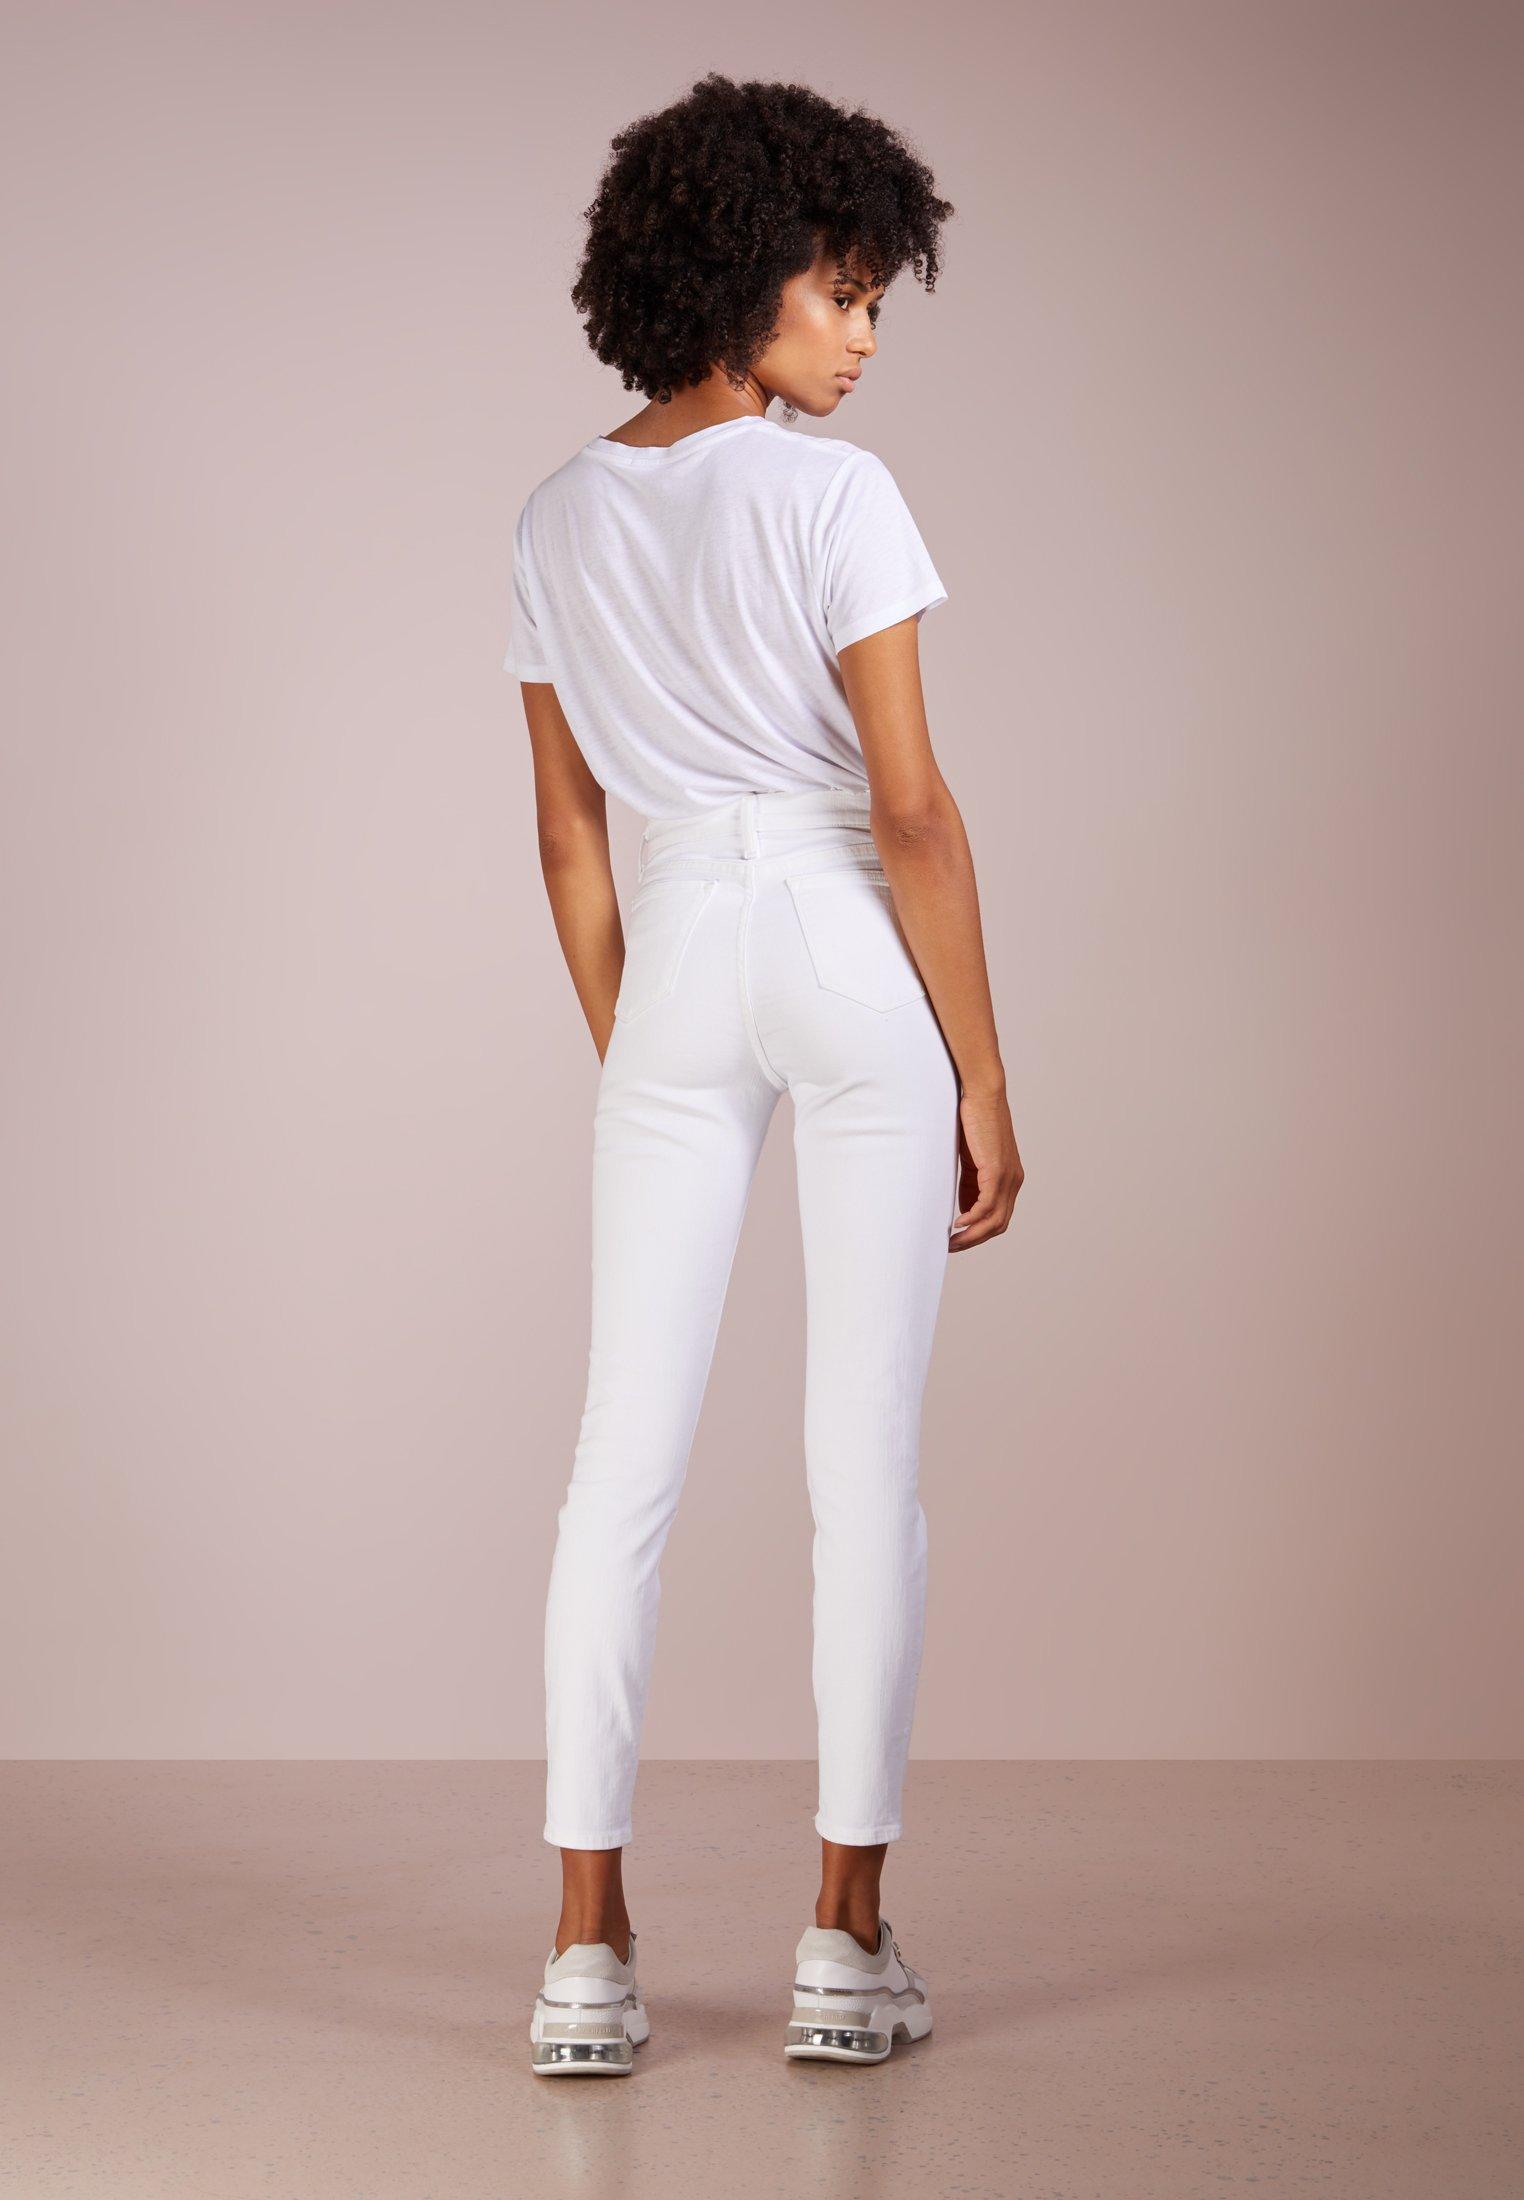 J.CREW Jeansy Slim Fit - white